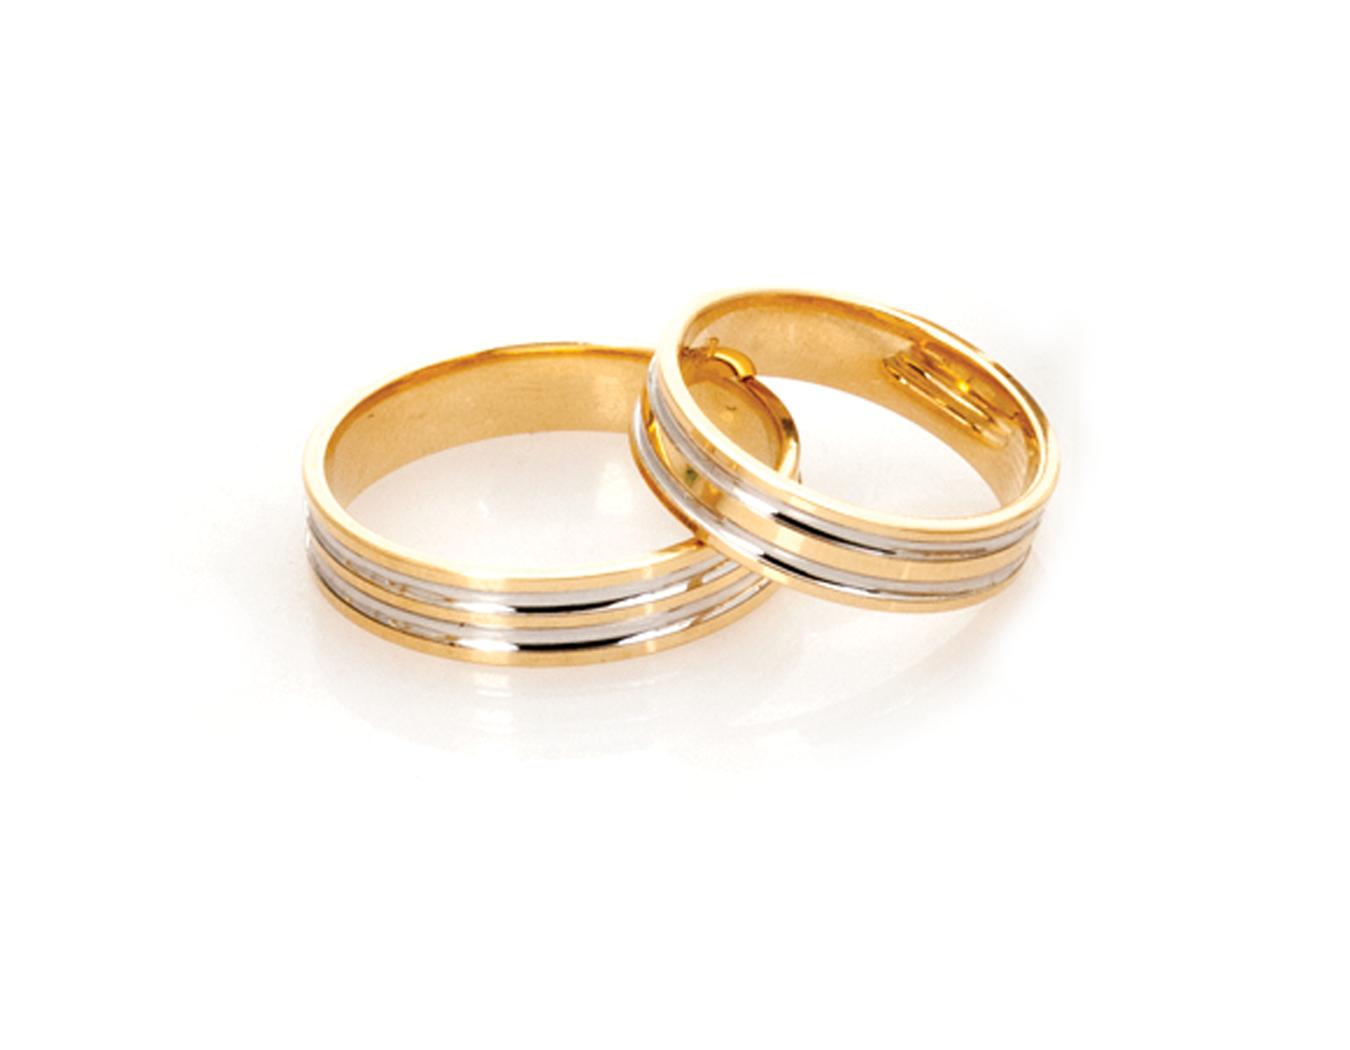 Pareja De Alianzas Argyor 5150210r 5 Milímetros Ancho Vistas En Las Joyerías Men Wedding Bandswedding